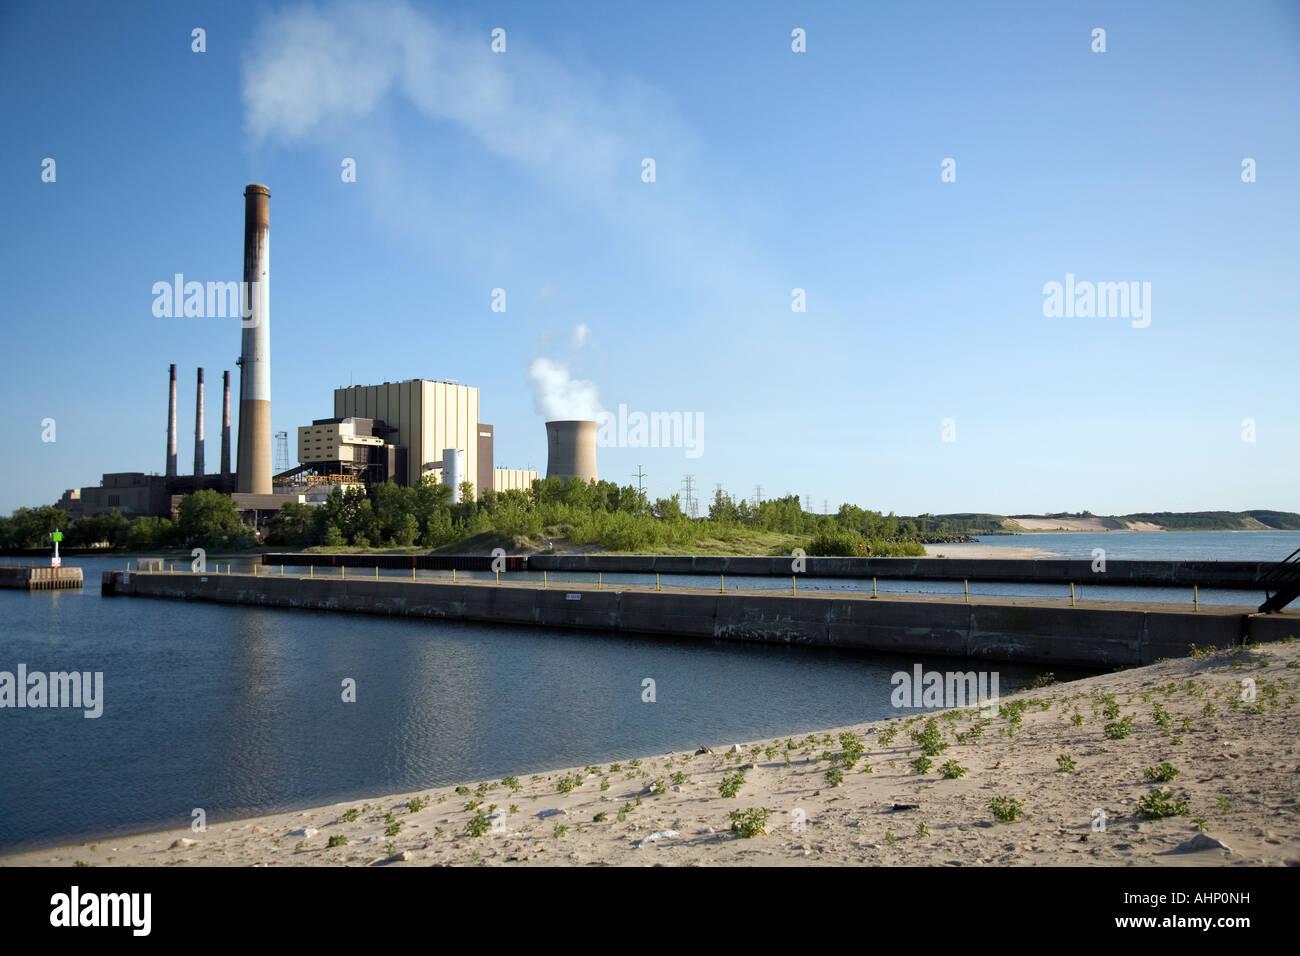 Northern Indiana Public Service Company NIPSCO power plant located